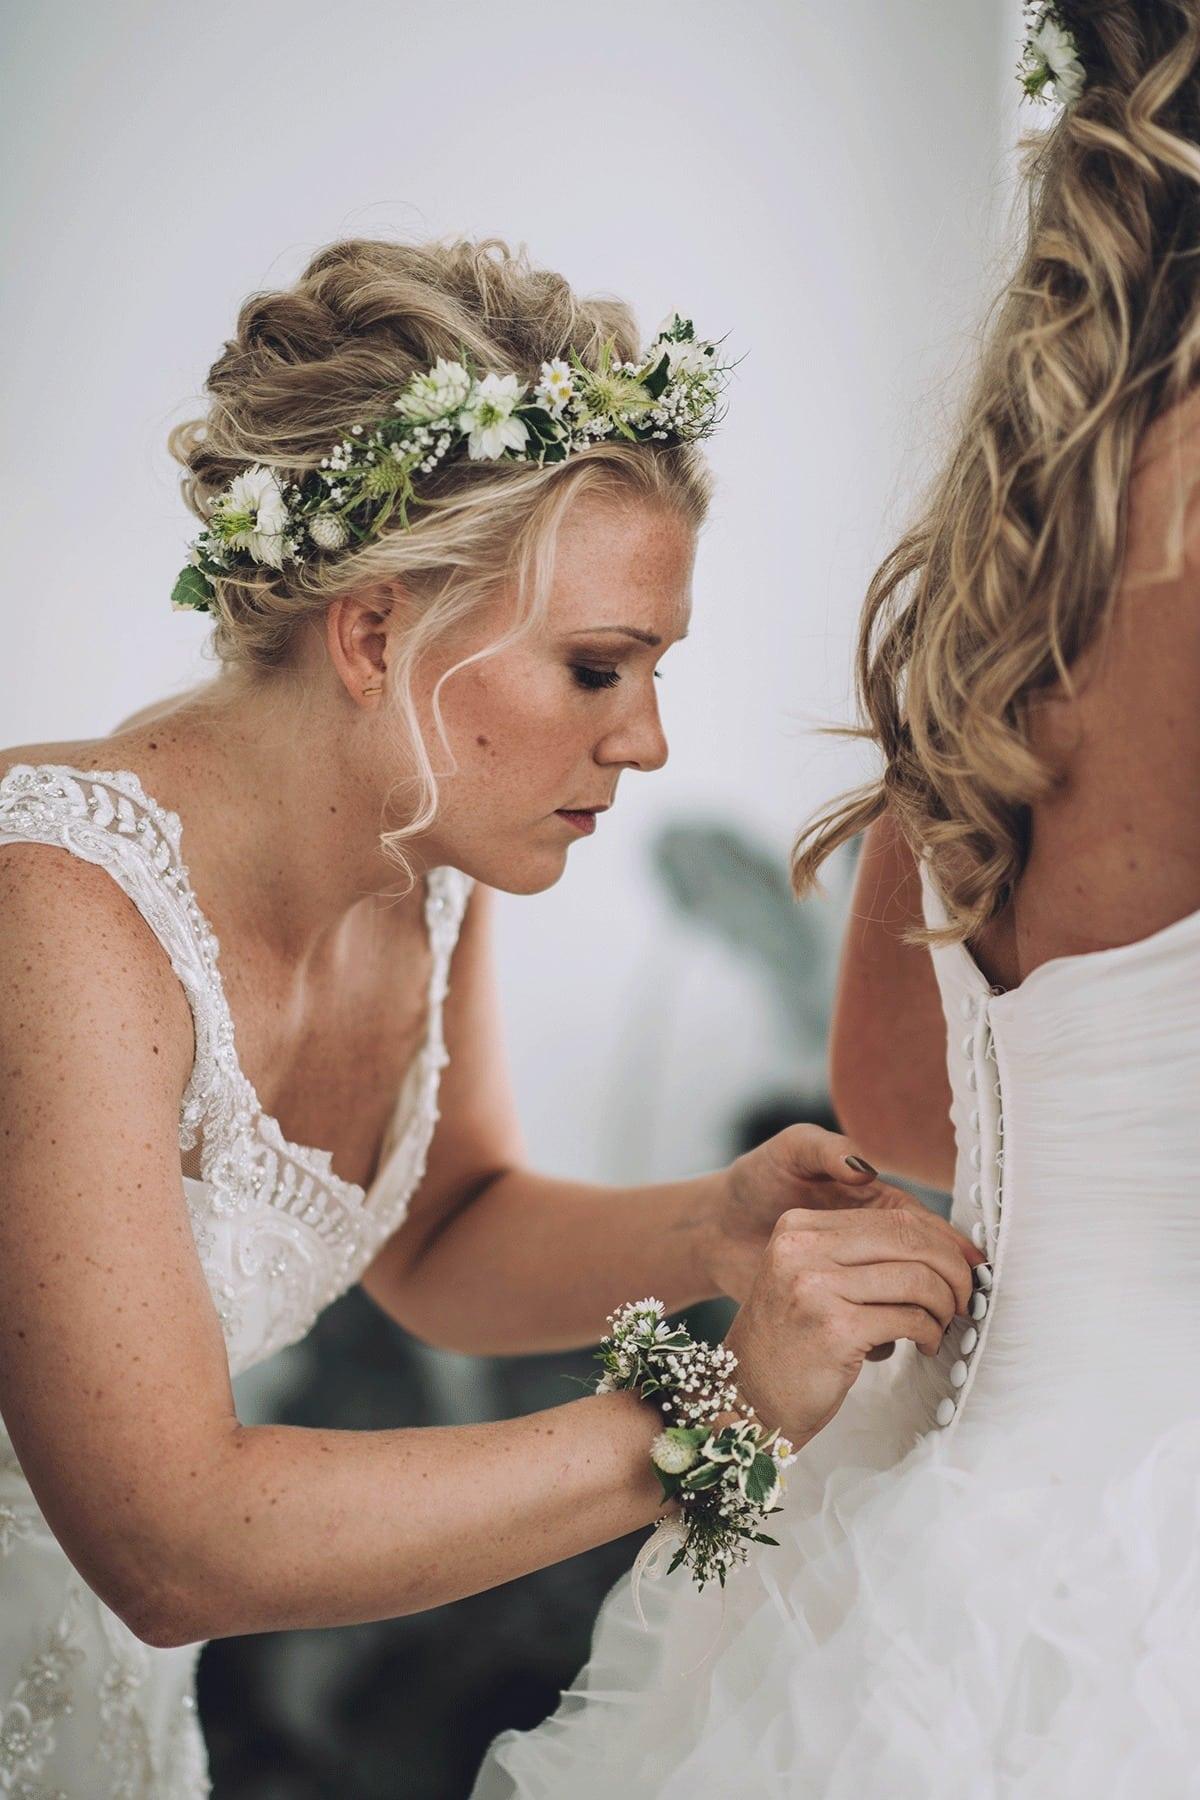 odizafotografie-bruidspaar-suzanne-en-stefanie-low-res-011